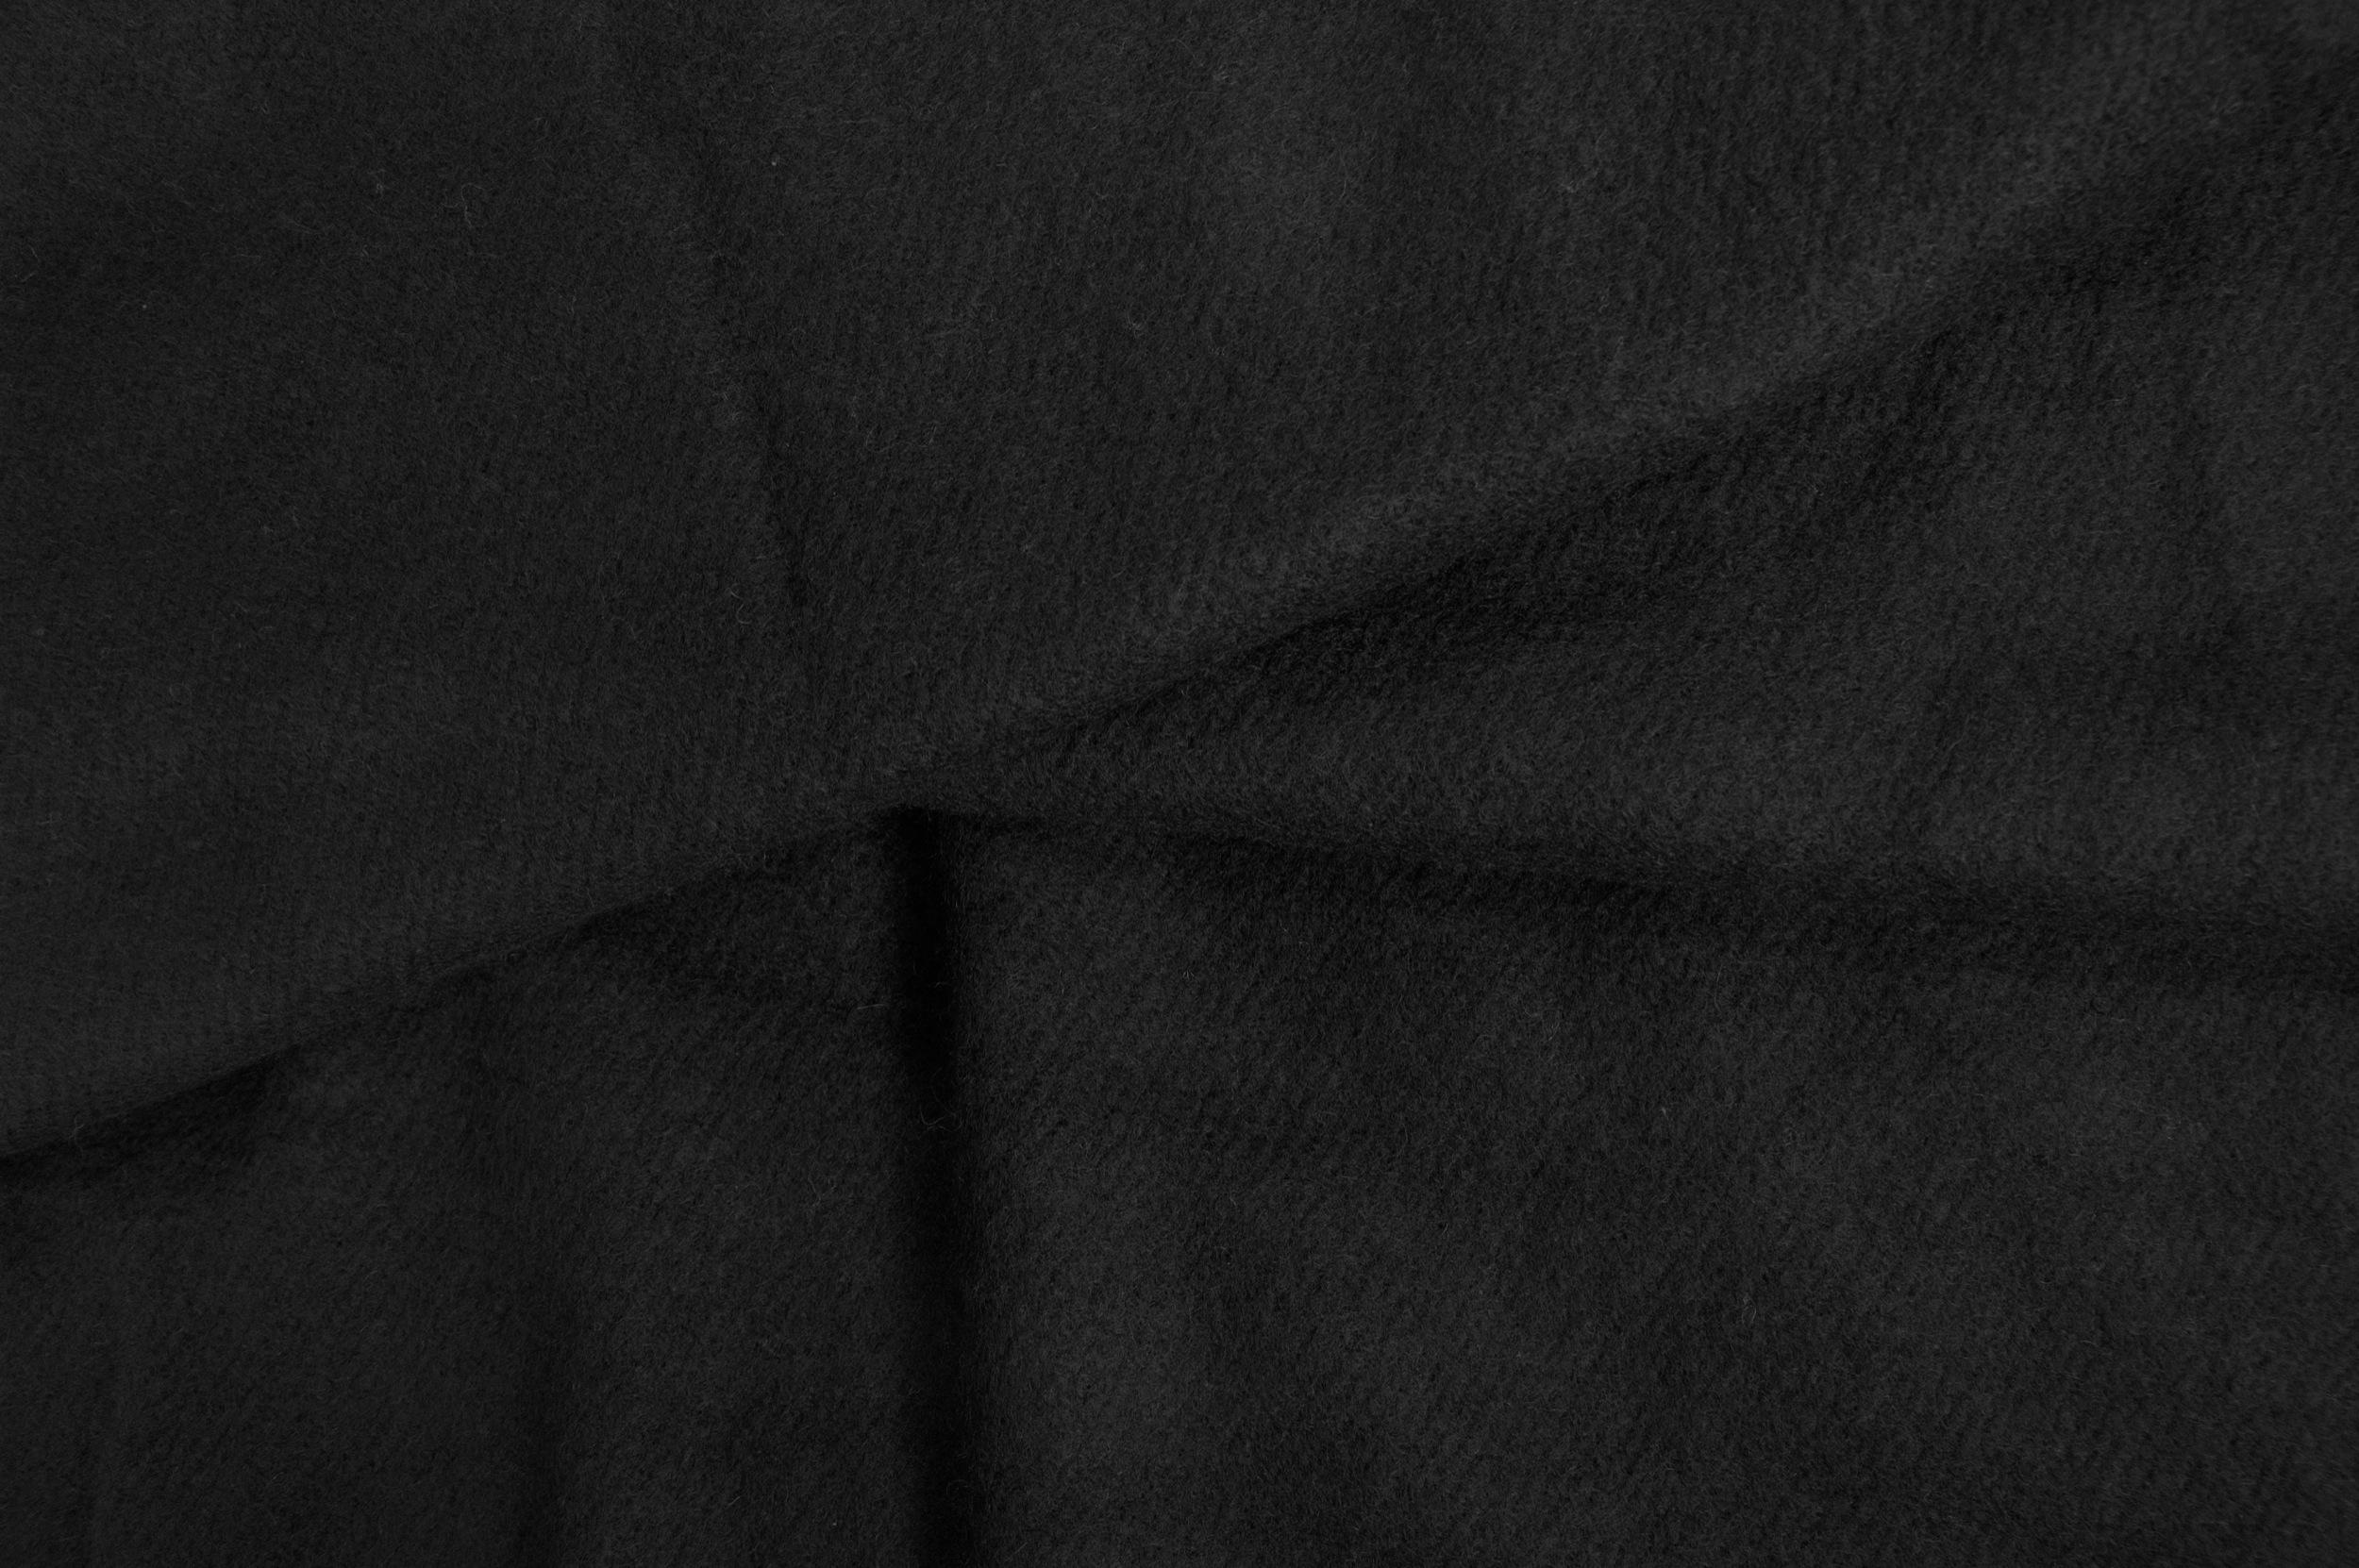 Sjaal van yak wol in zwart-stole